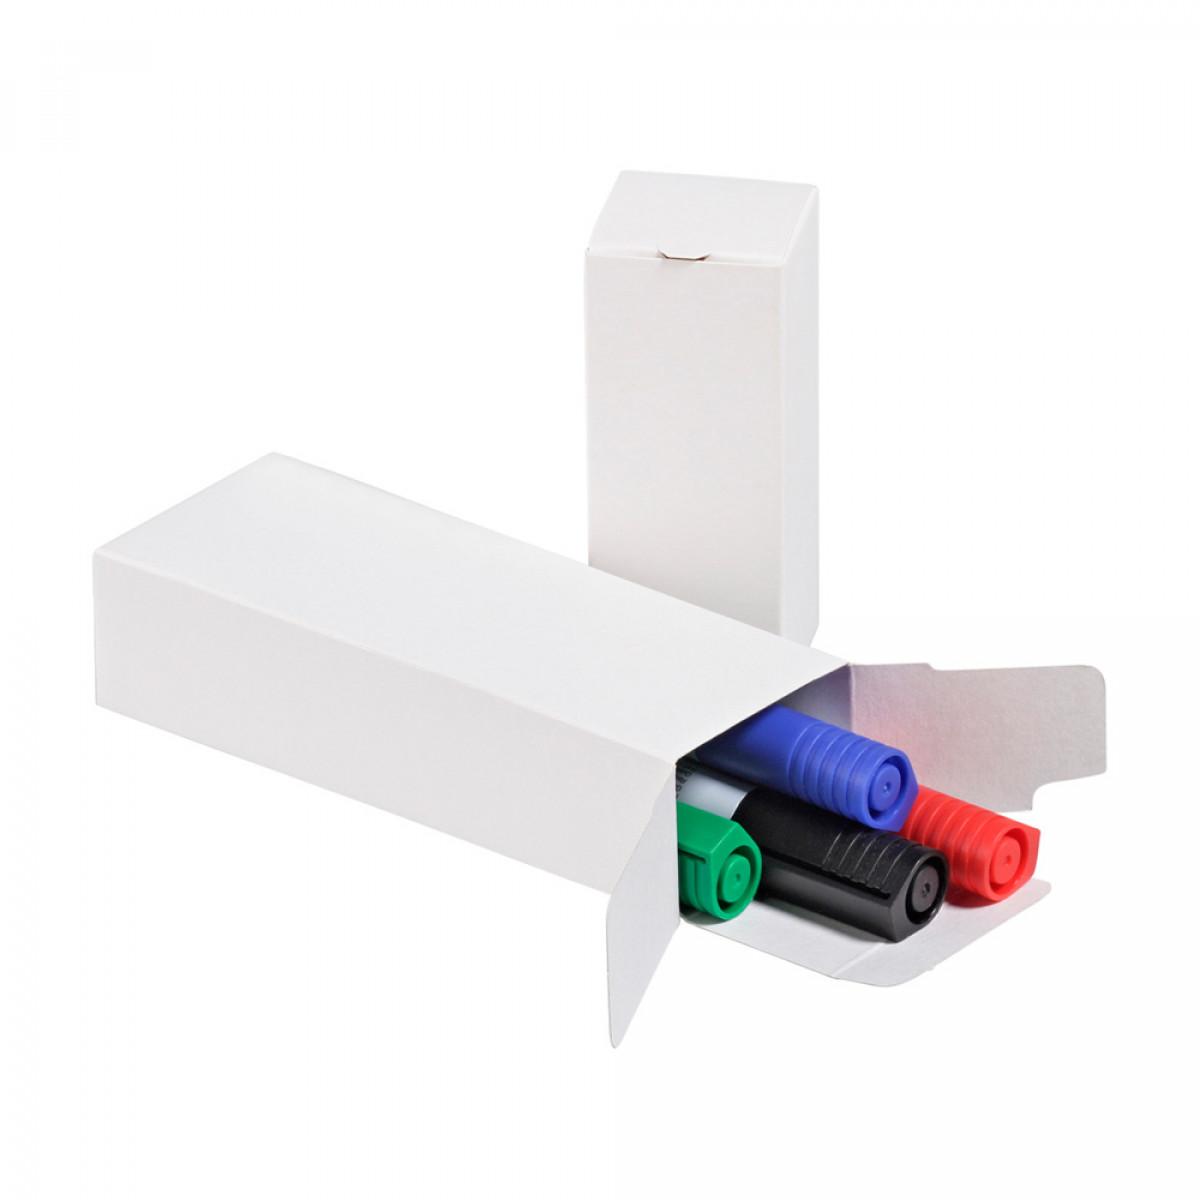 Kleine doos massief kt146/40,44x35x205mm